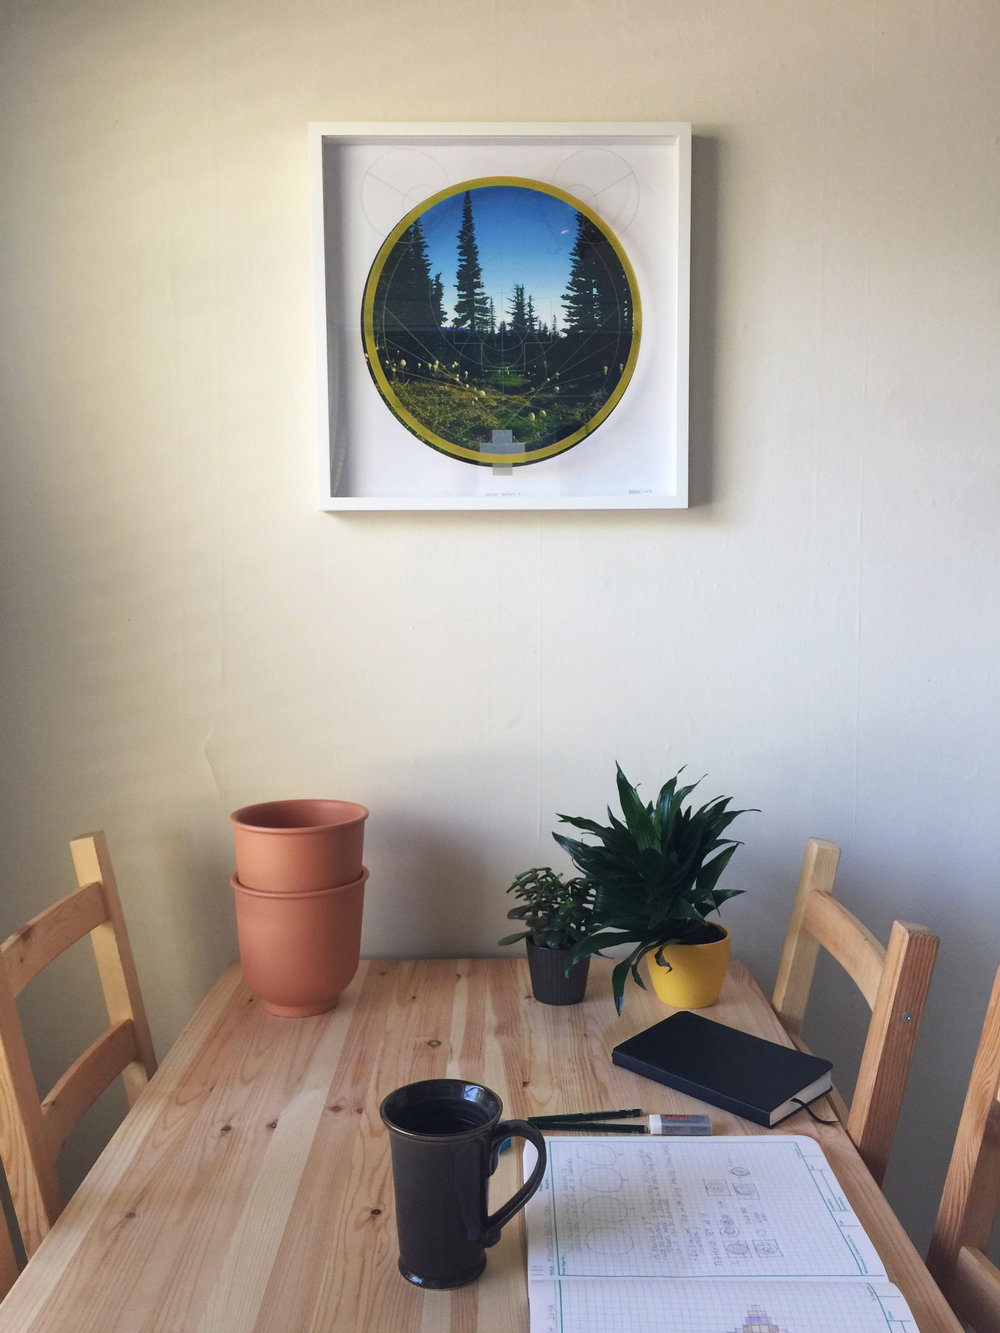 Rainier Botany 3 on wall.jpg